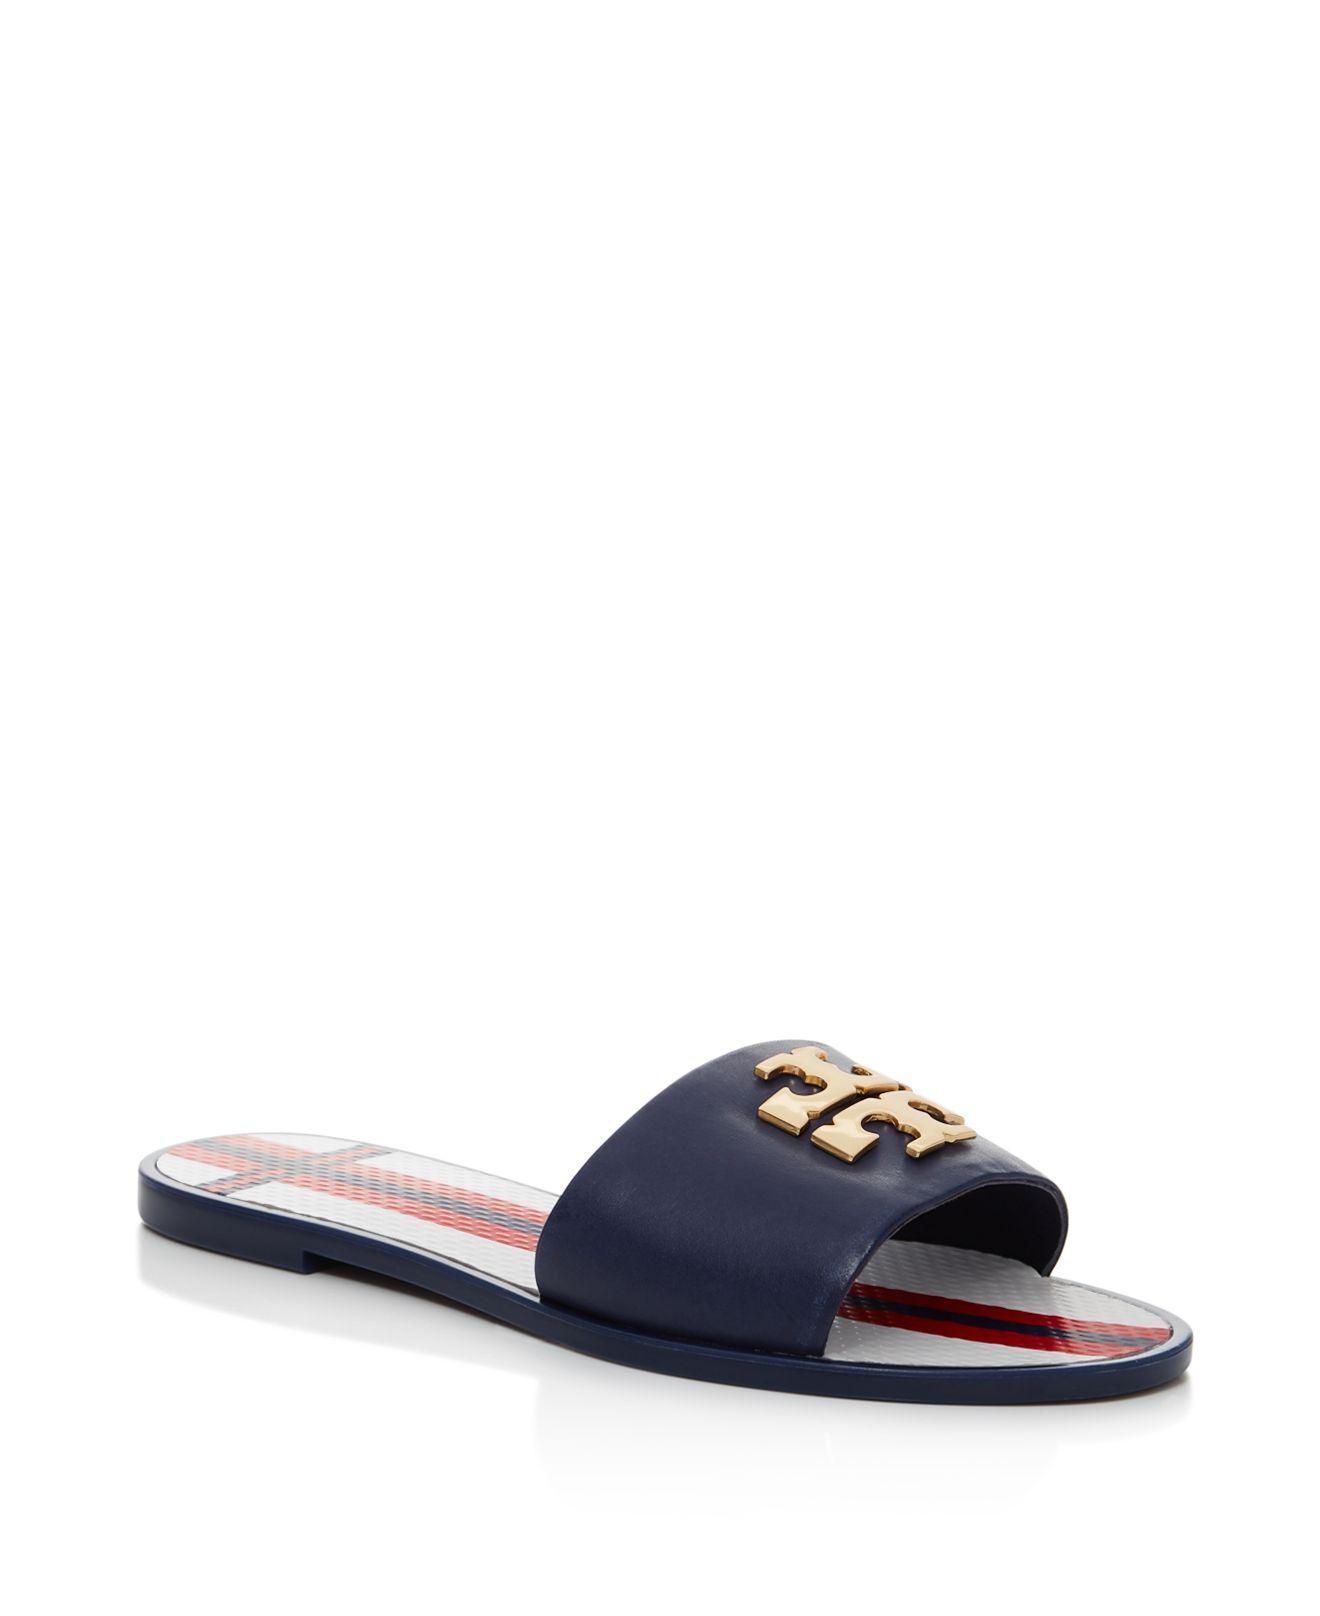 706ac6f03151 Lyst - Tory Burch Logo Jelly Slide Sandal